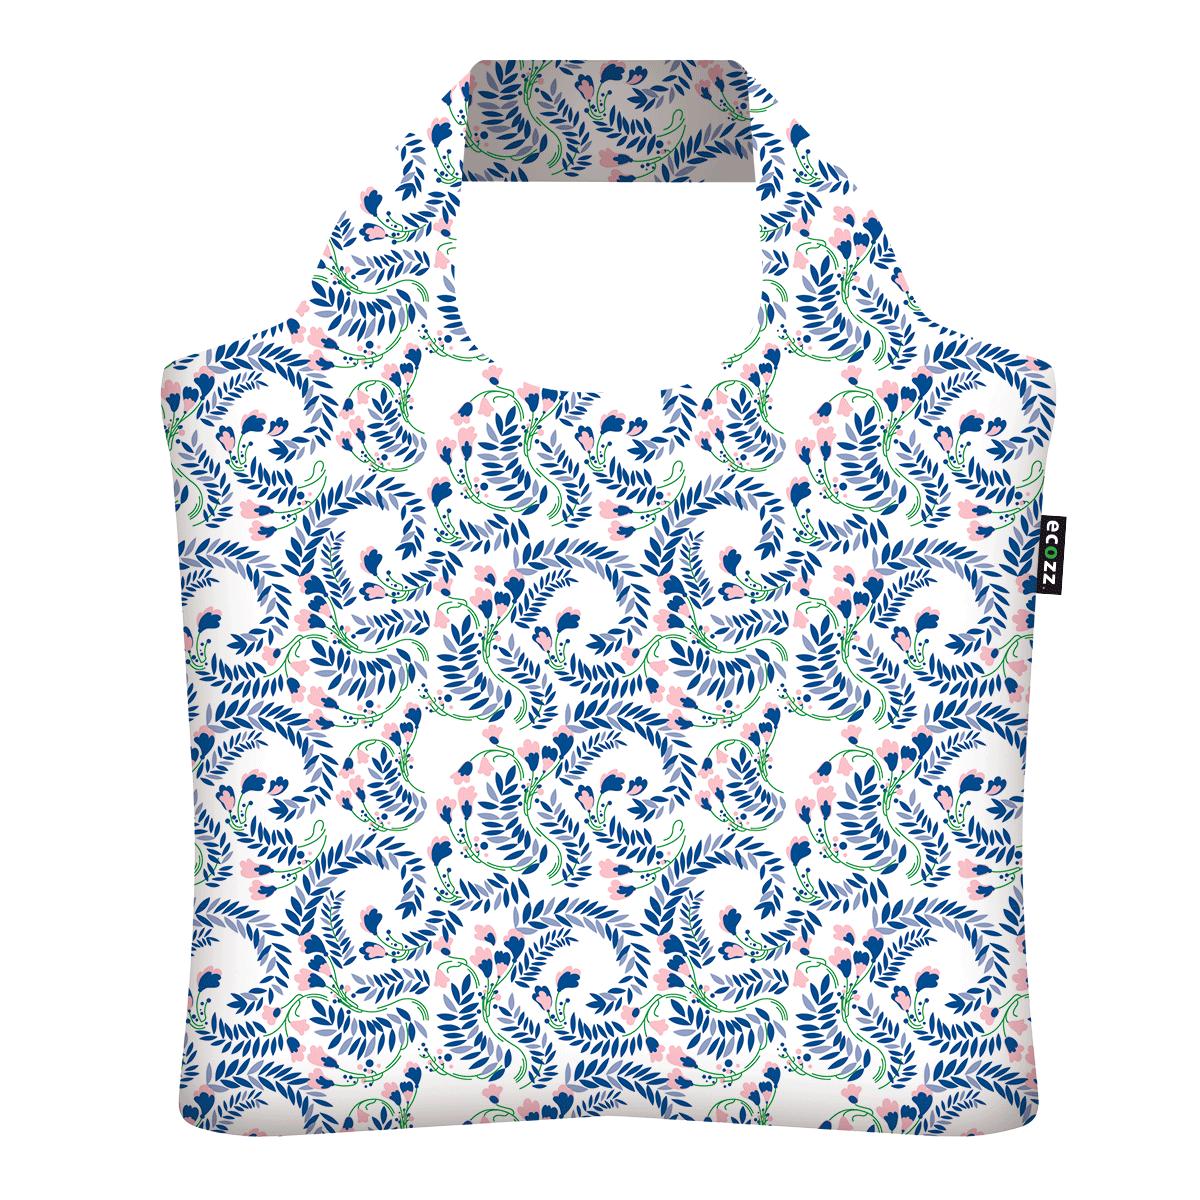 "Ekologická skládací taška ECOZZ - design ""Jaro"""